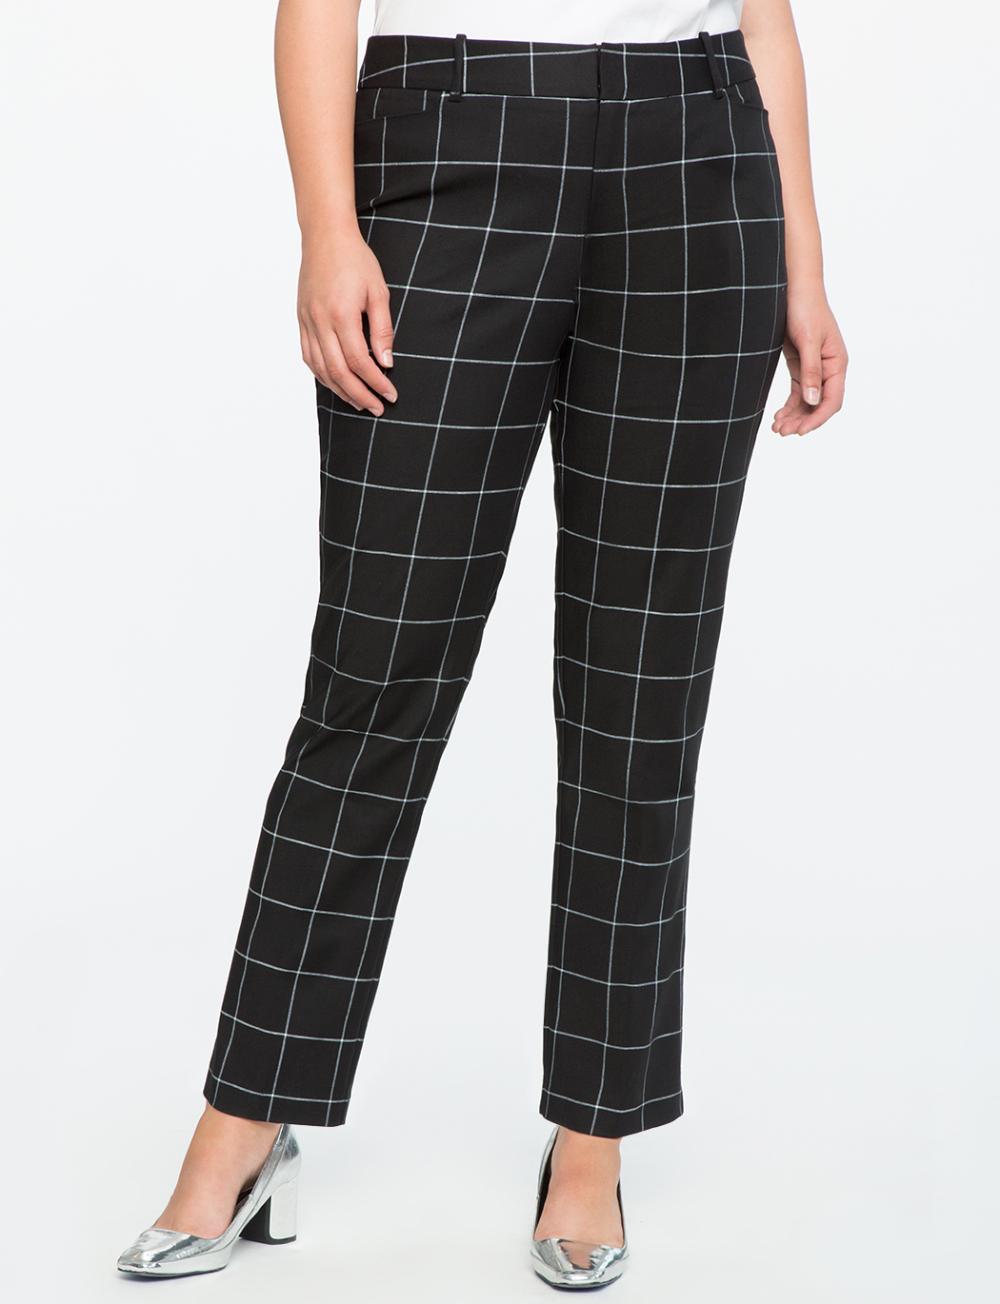 Photo of Windowpane Print Kady Pant | Women's Plus Size Pants | ELOQUII